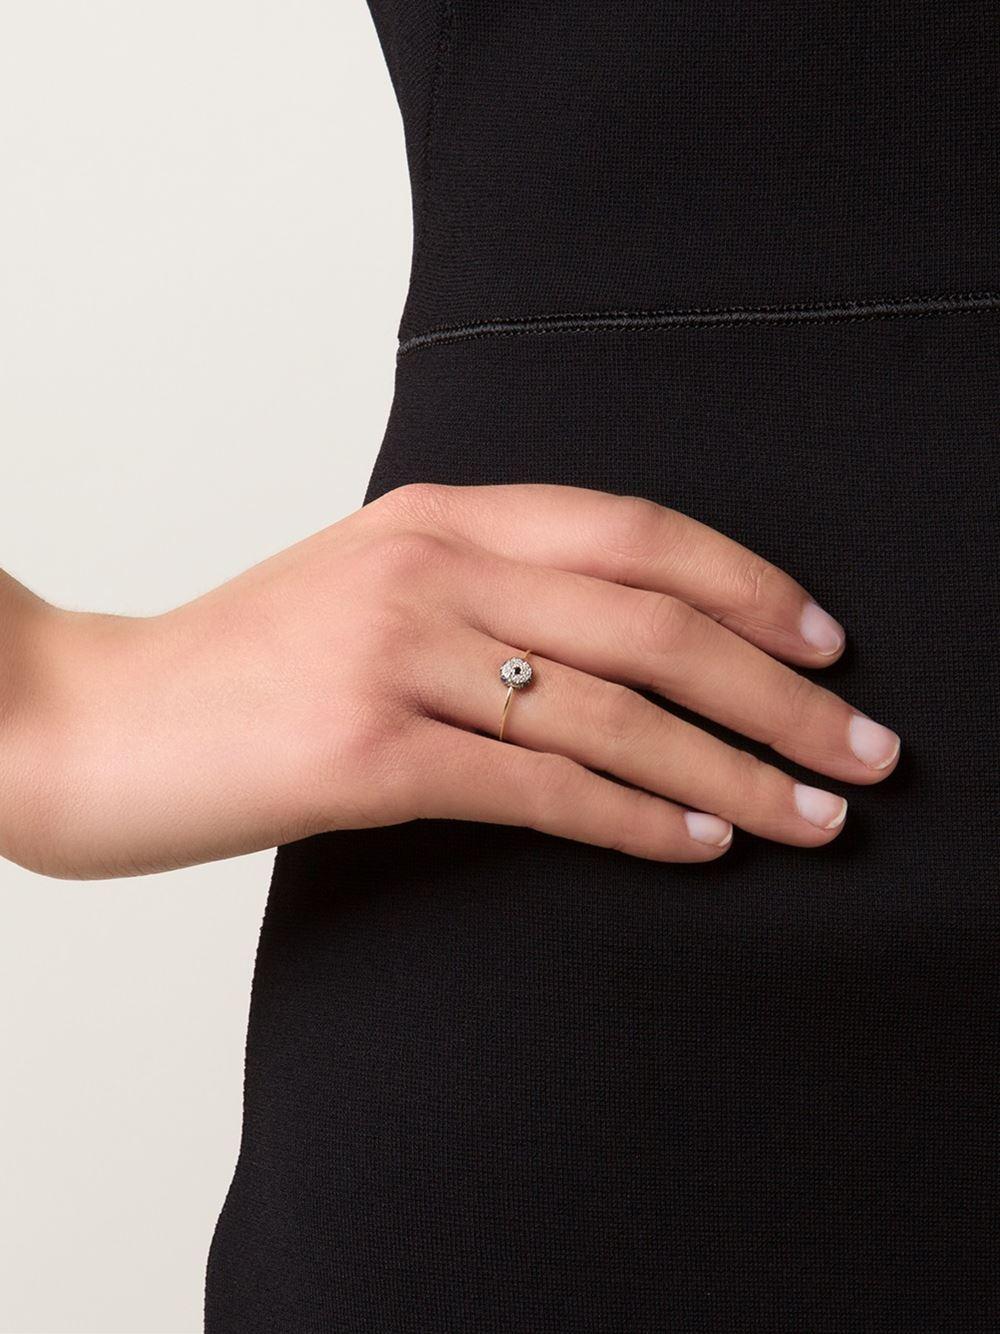 Sydney Evan Single Turquoise Cabochon Evil Eye Ring w/Diamonds JAjVC67